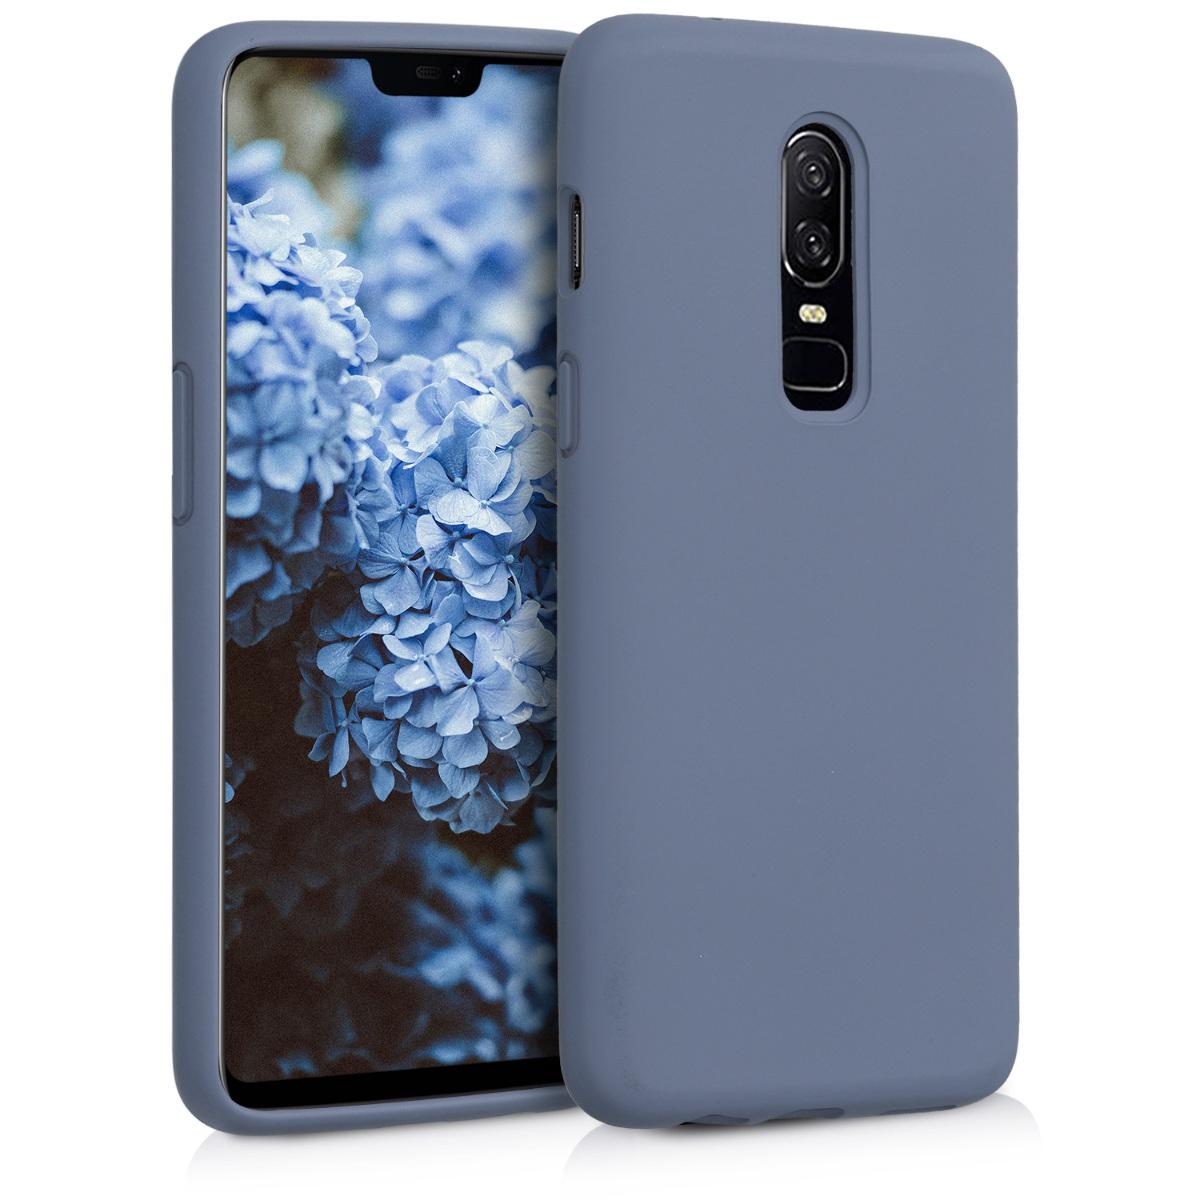 KW TPU Θήκη Σιλικόνης - OnePlus 6 - Lavender Grey (46122.130)